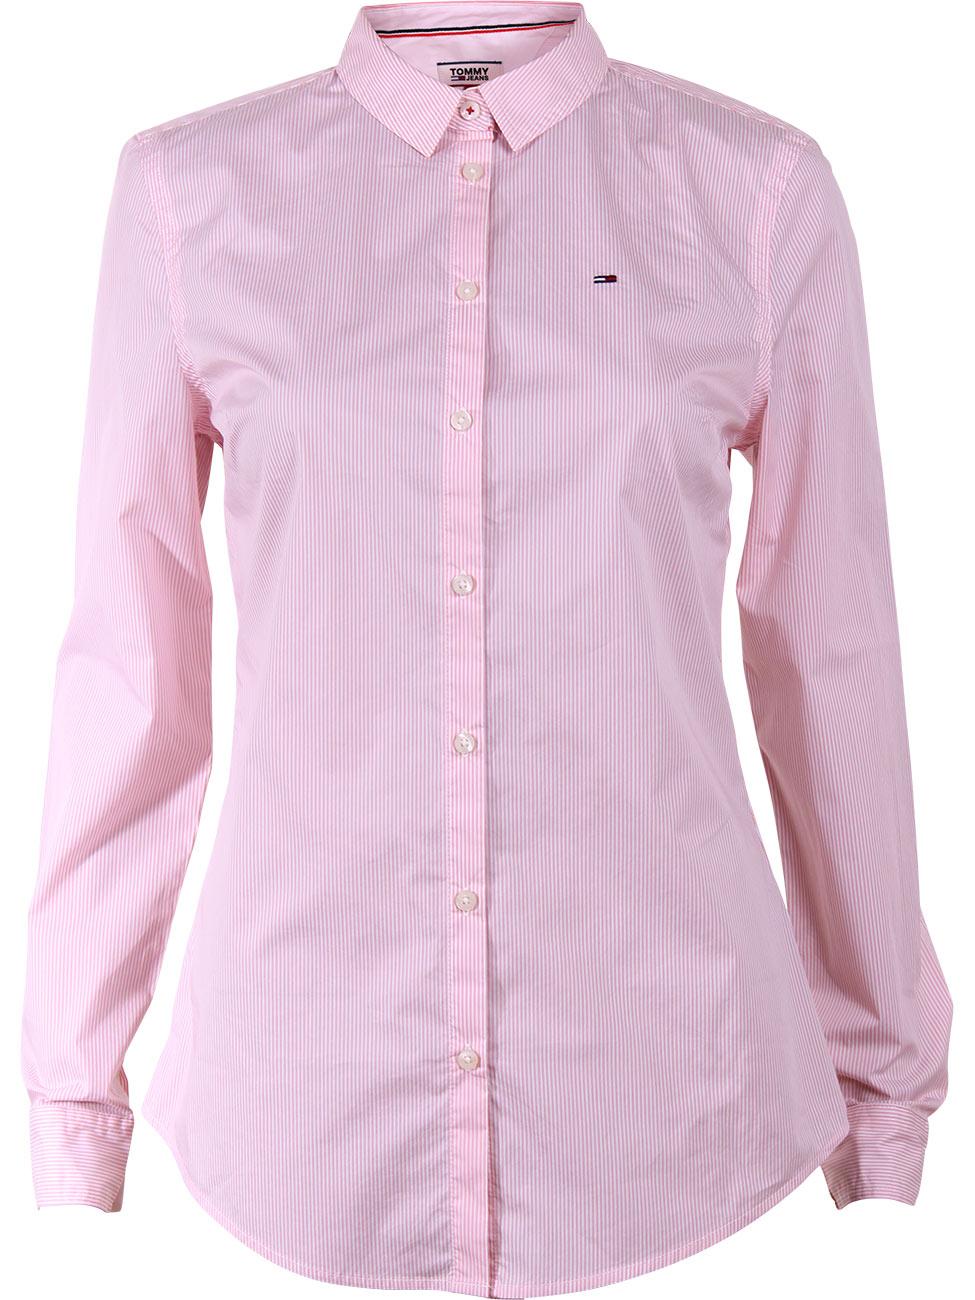 tommy-hilfiger-damen-bluse-tjw-original-stripe-stretch-shirt, 55.93 EUR @ jeans